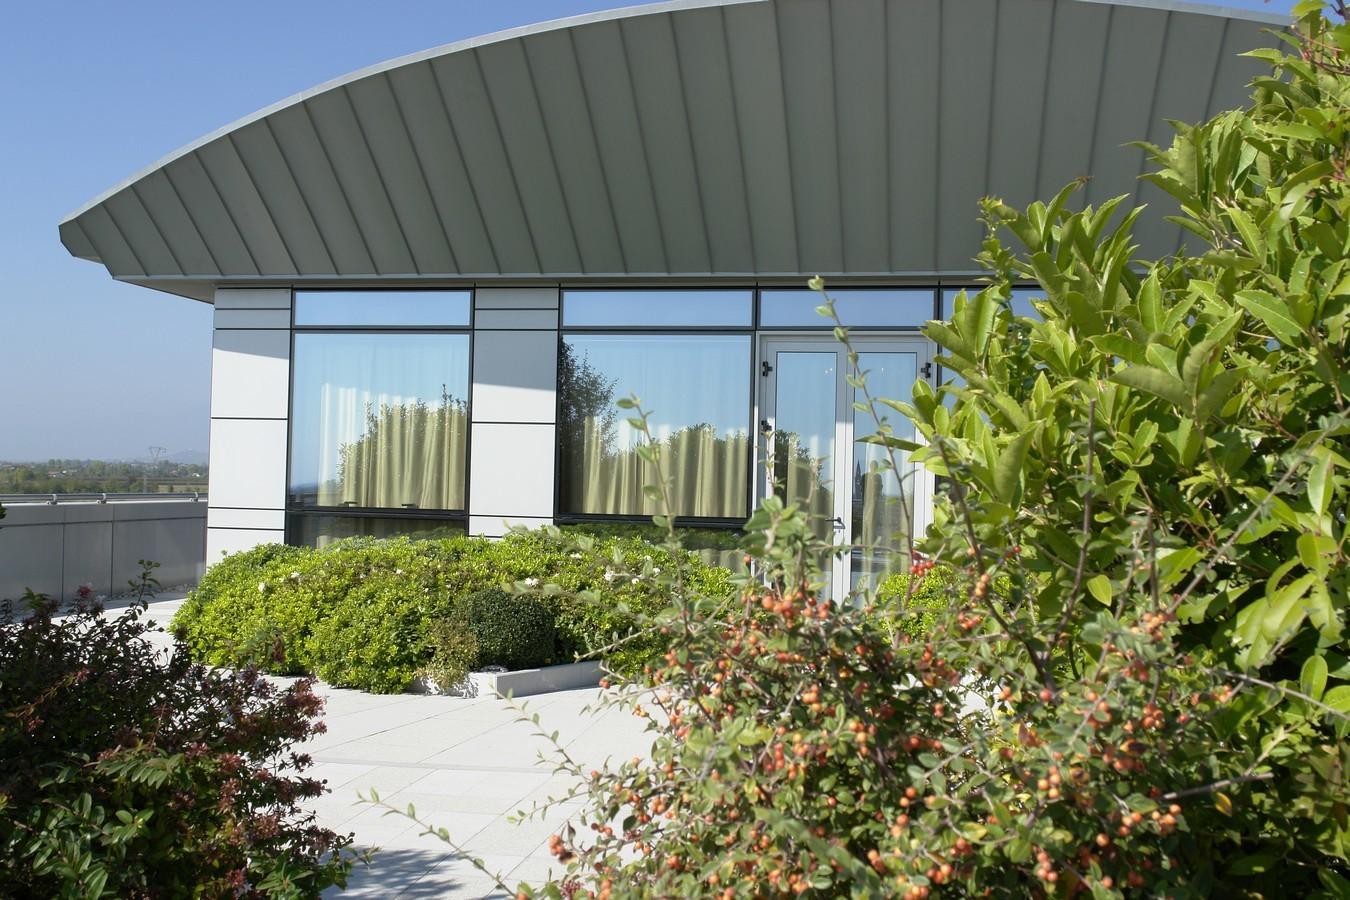 Veneto Banca - دفترمرکزی